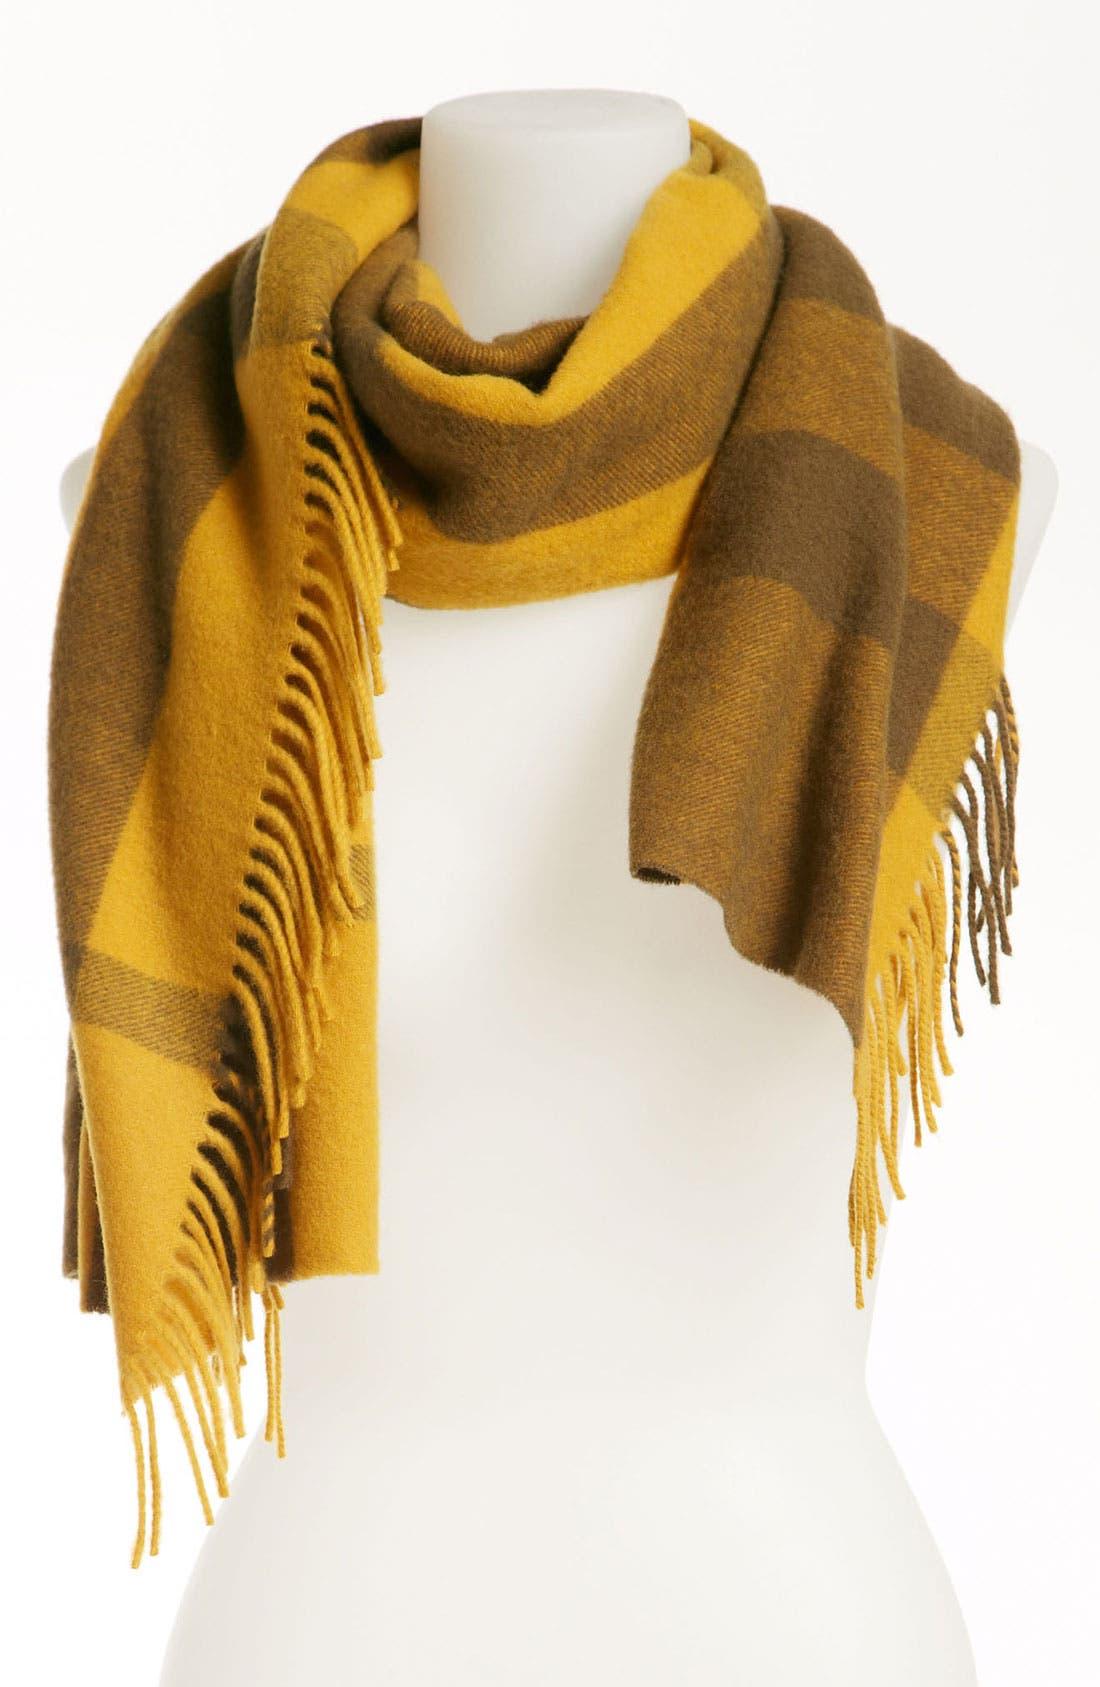 Alternate Image 1 Selected - Burberry Tonal Check Merino Wool & Cashmere Muffler